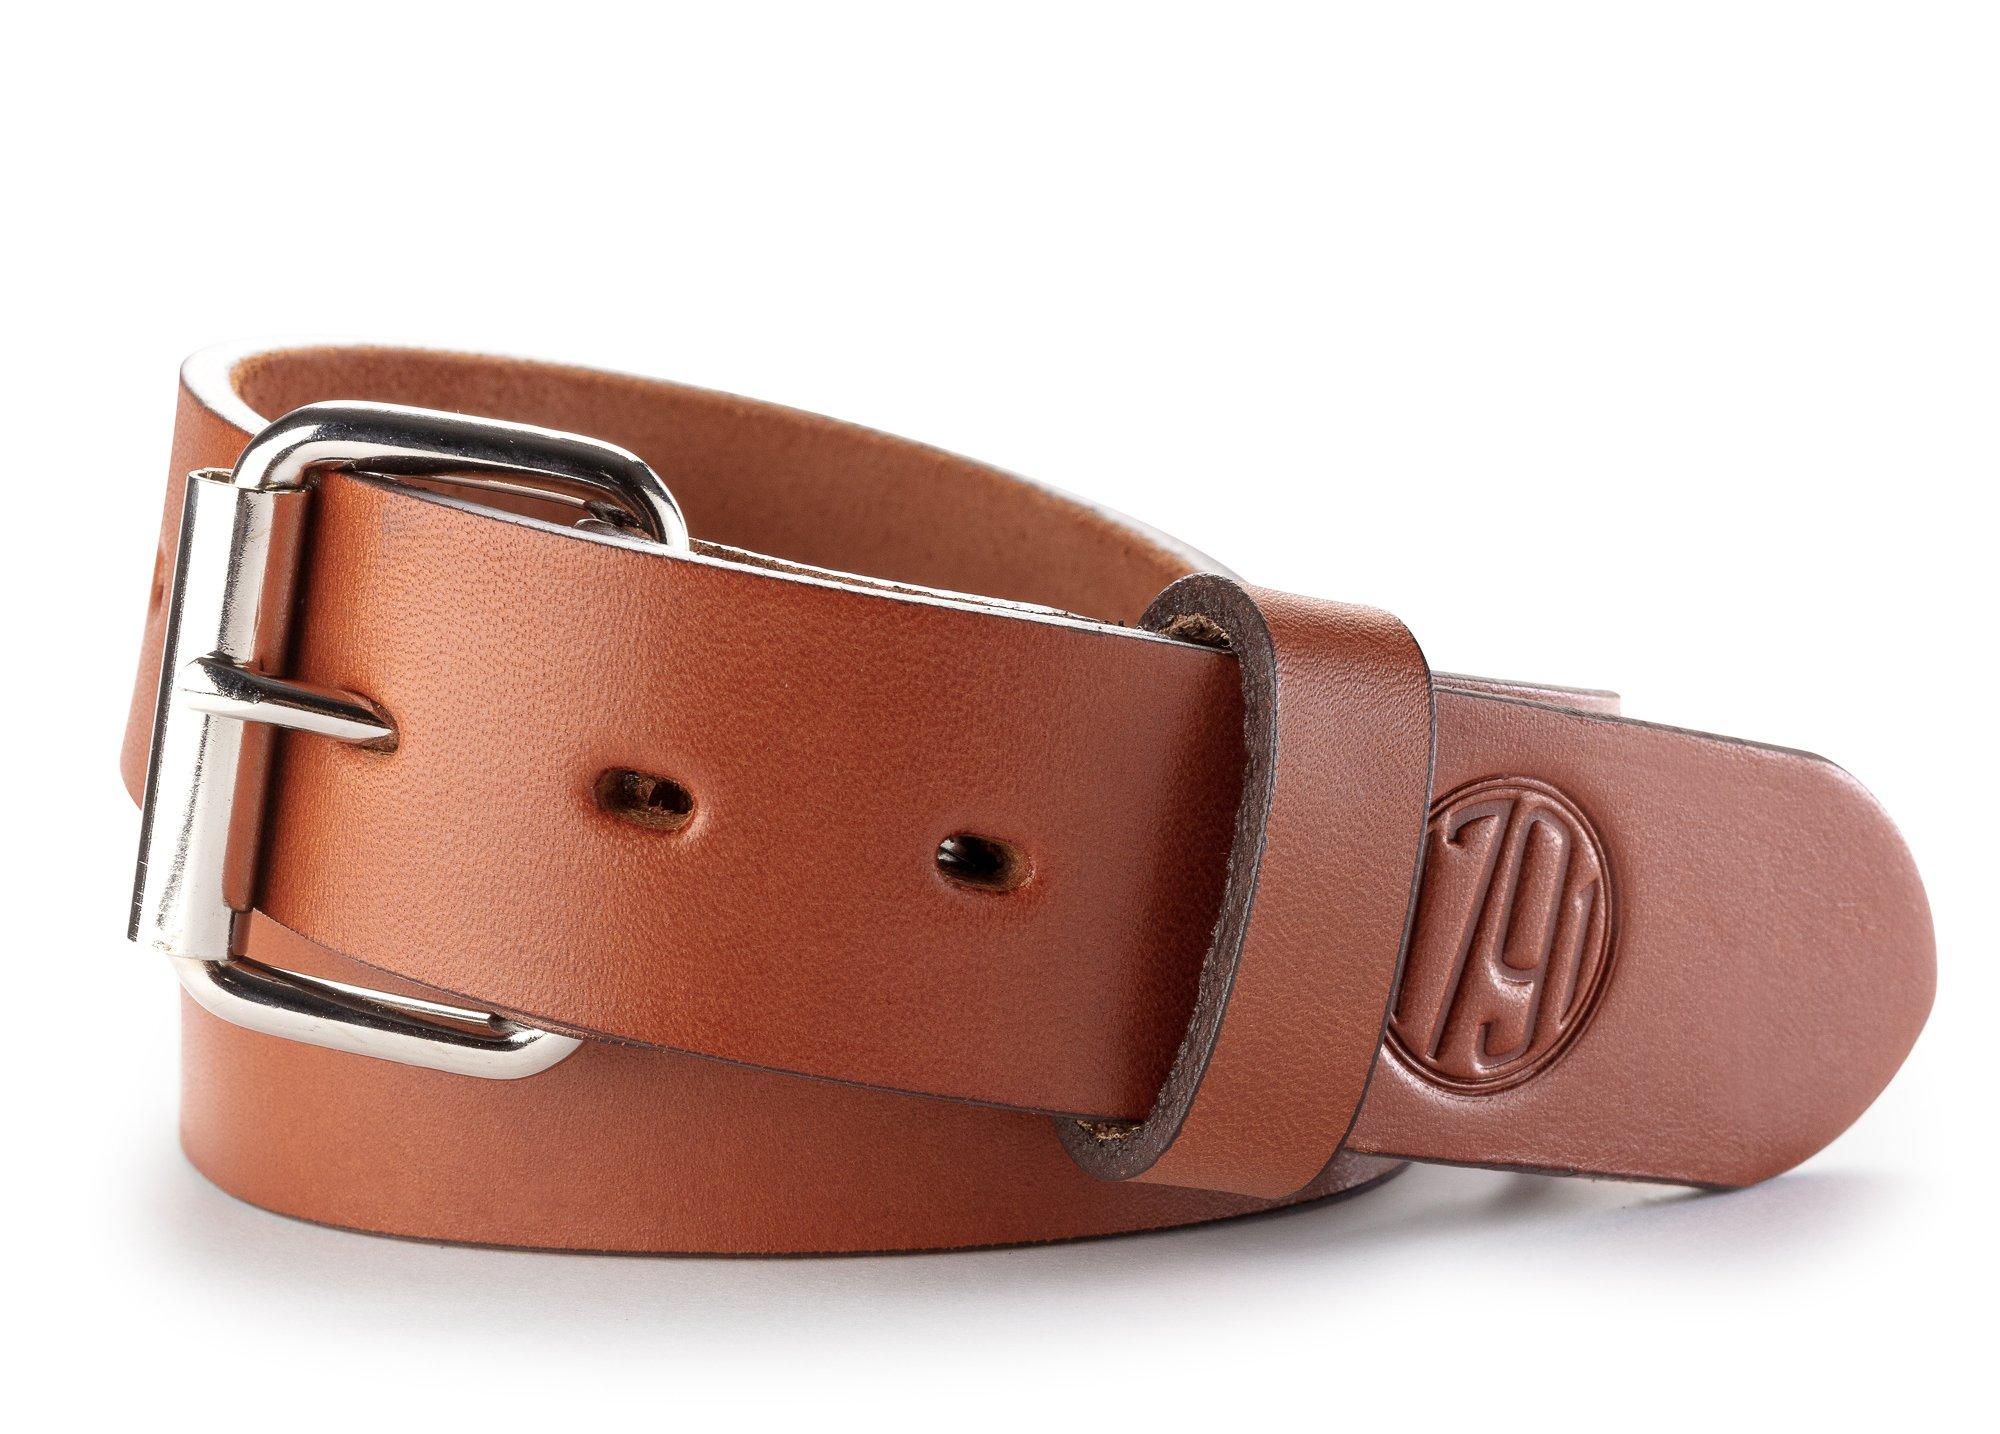 1791 GUNLEATHER BLT-01-34/38-CBR-A Belt Classic BRN 34/38